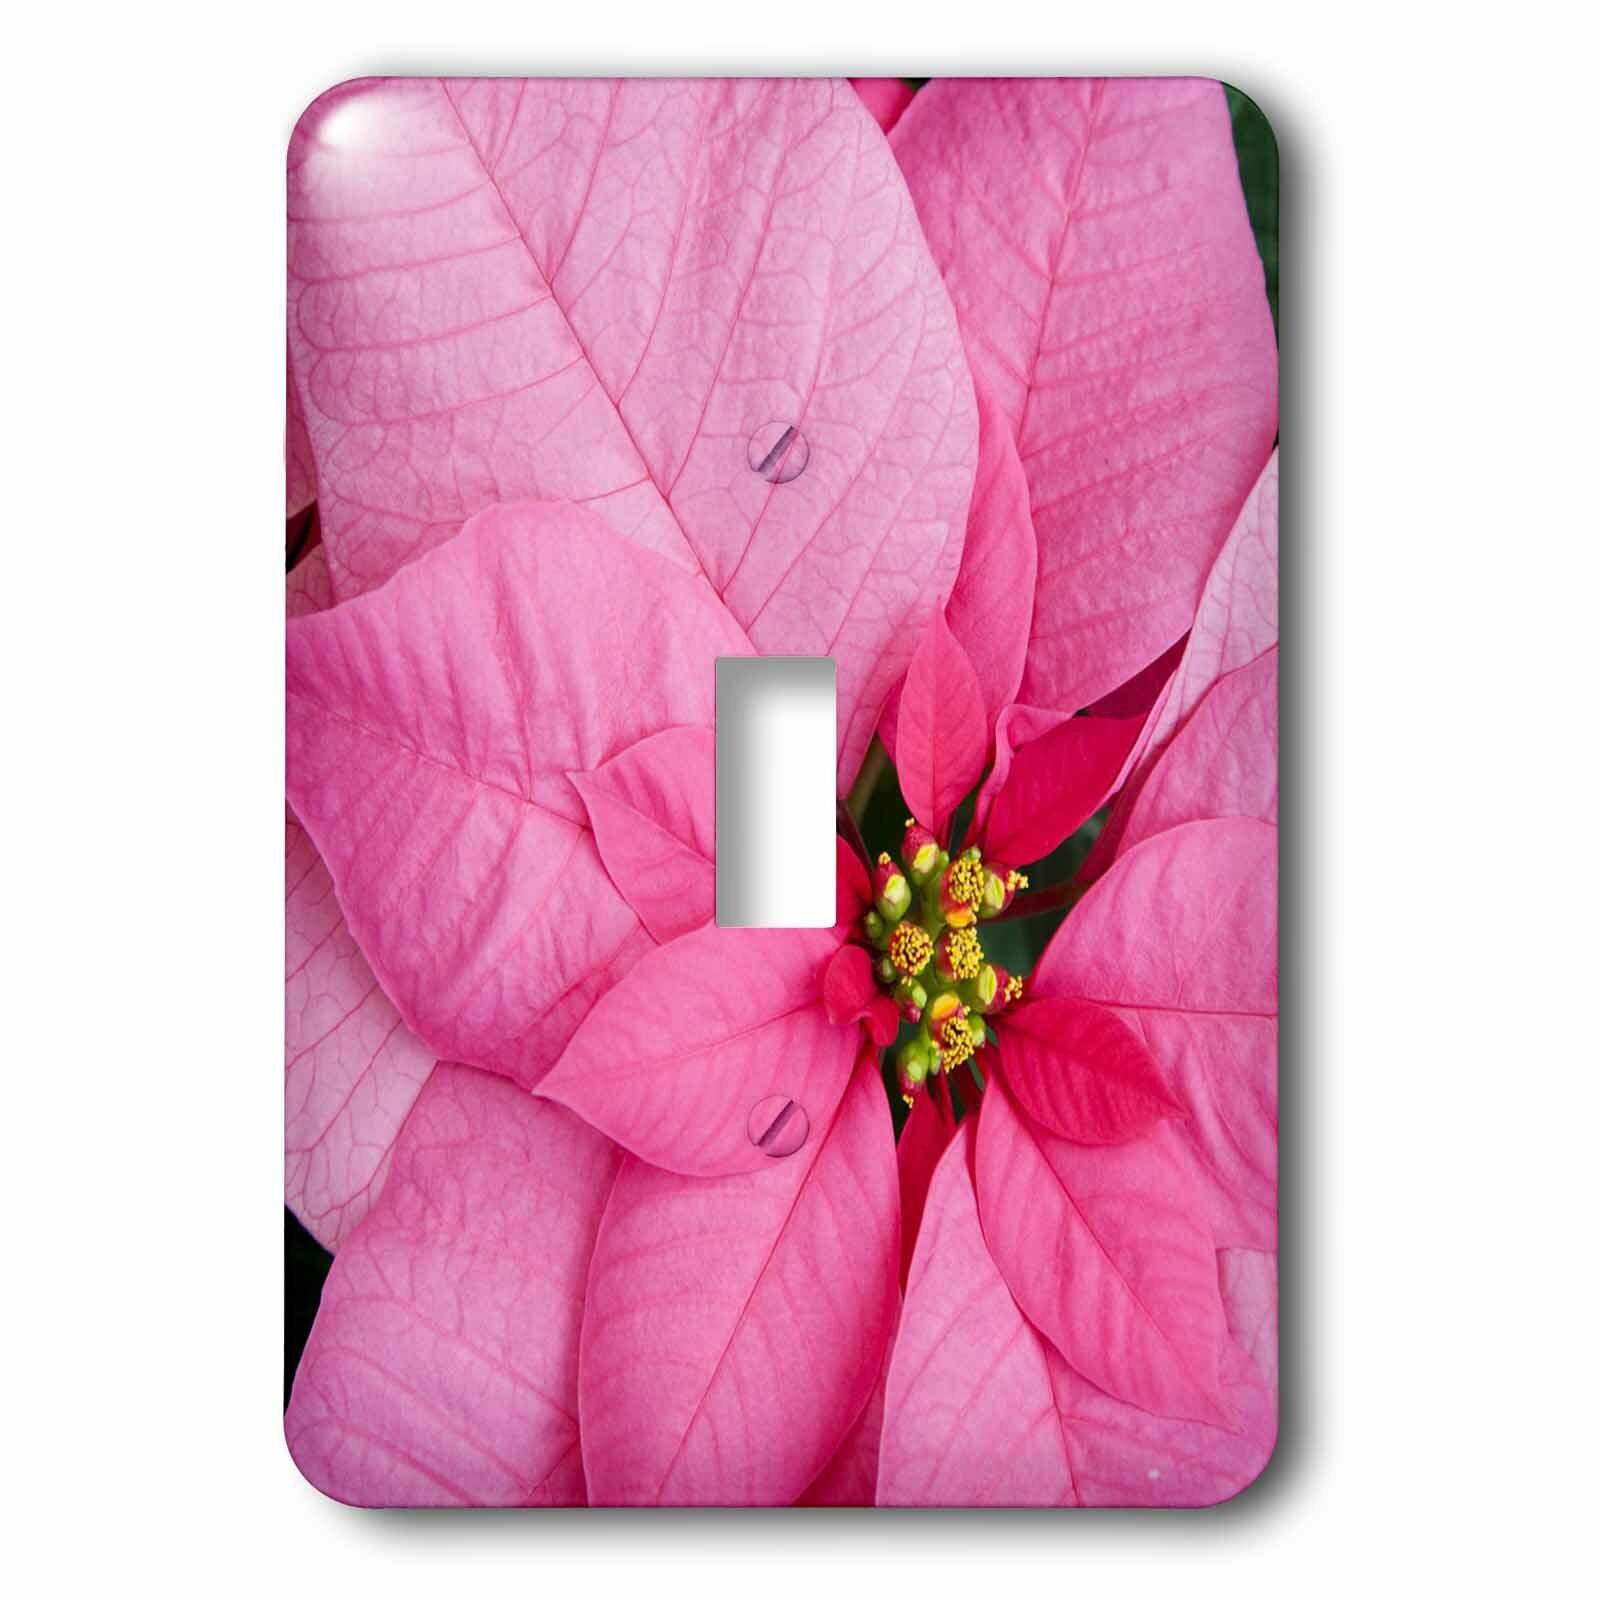 3drose Wa Molbaks Nursery Poinsettia Flower Festival 1 Gang Toggle Light Switch Wall Plate Wayfair